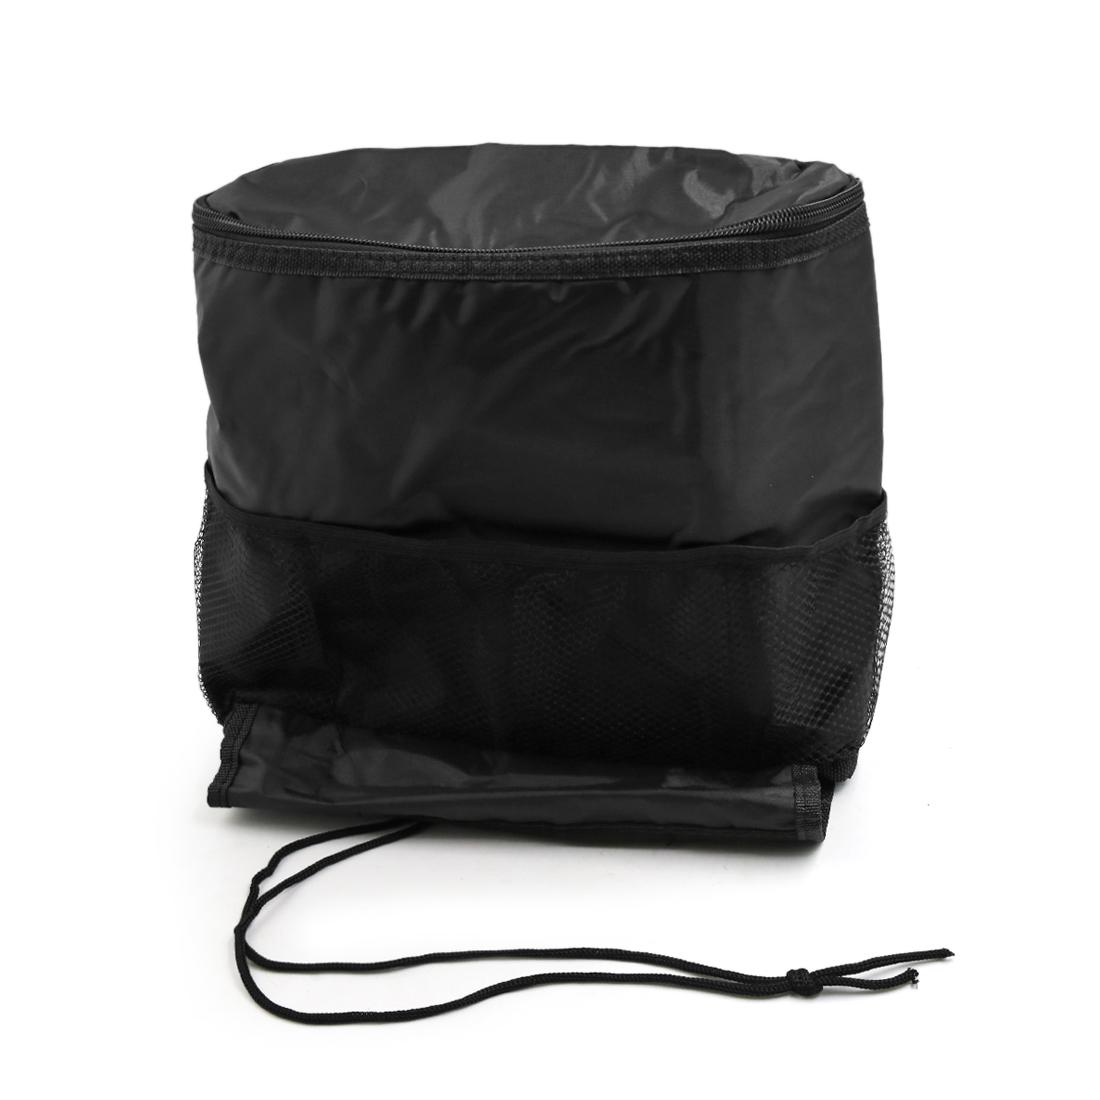 Car Black Seat Back Pocket Organizer Holder Storage Travel Hanging Bag